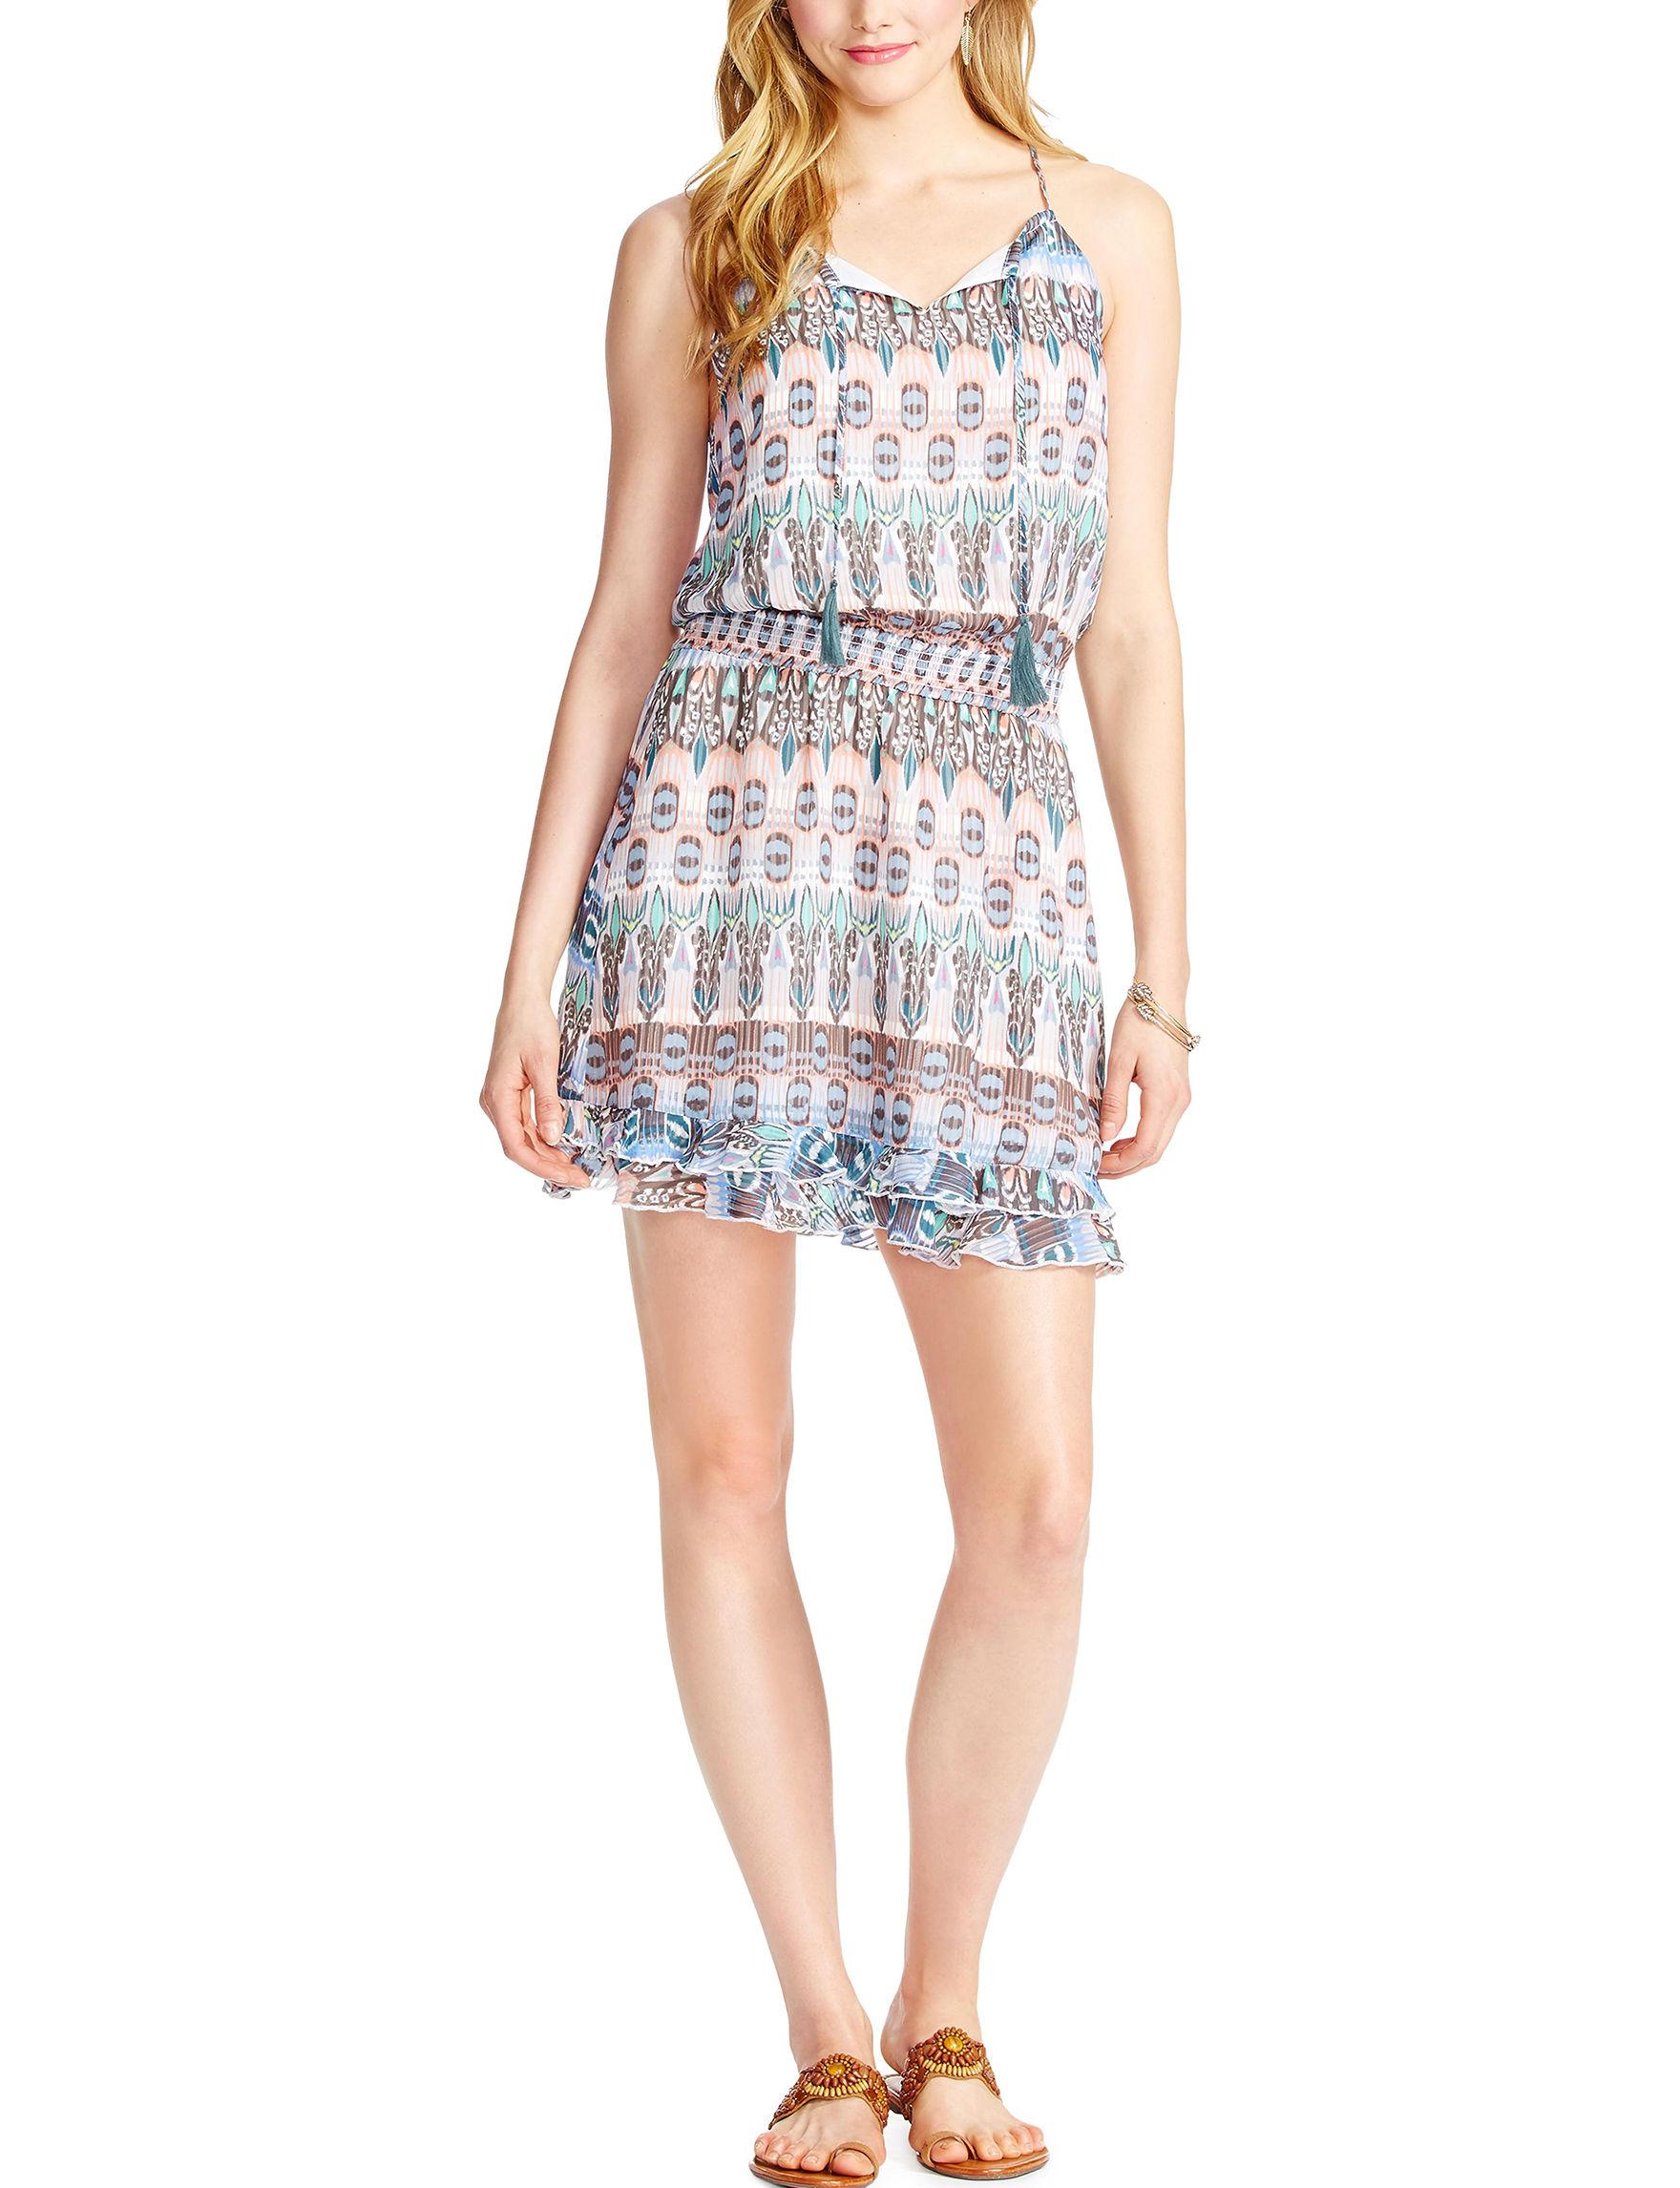 Jessica Simpson Turquoise Sundresses